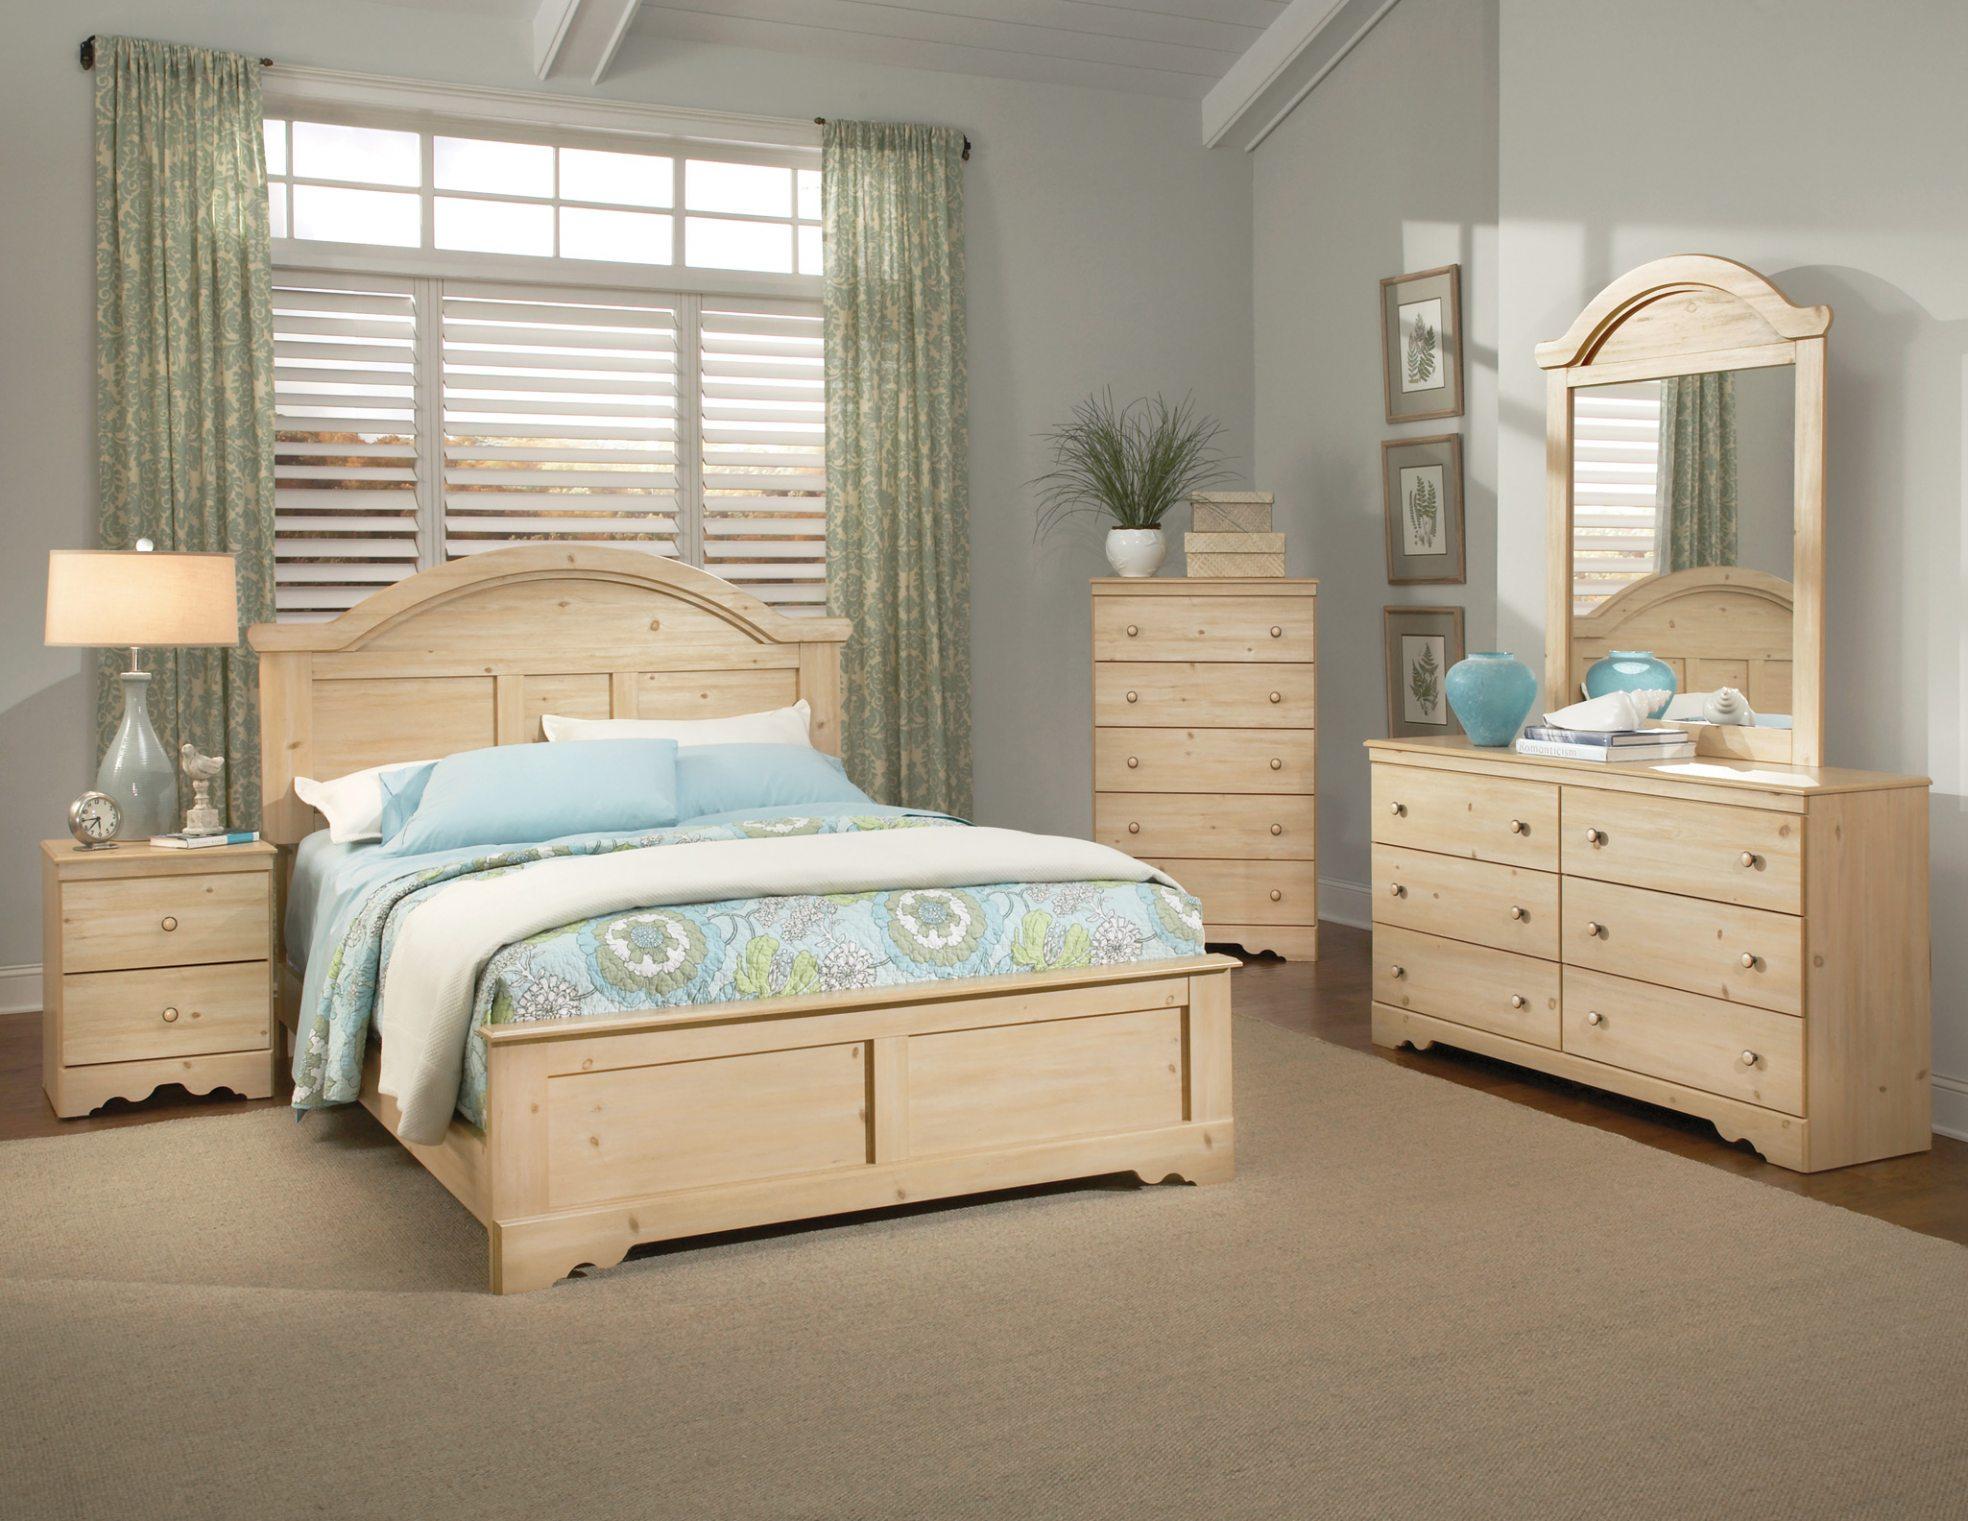 pine bedroom furniture set photo 4 of 7 image of: pine bedroom furniture sets (beautiful EIOCZIL